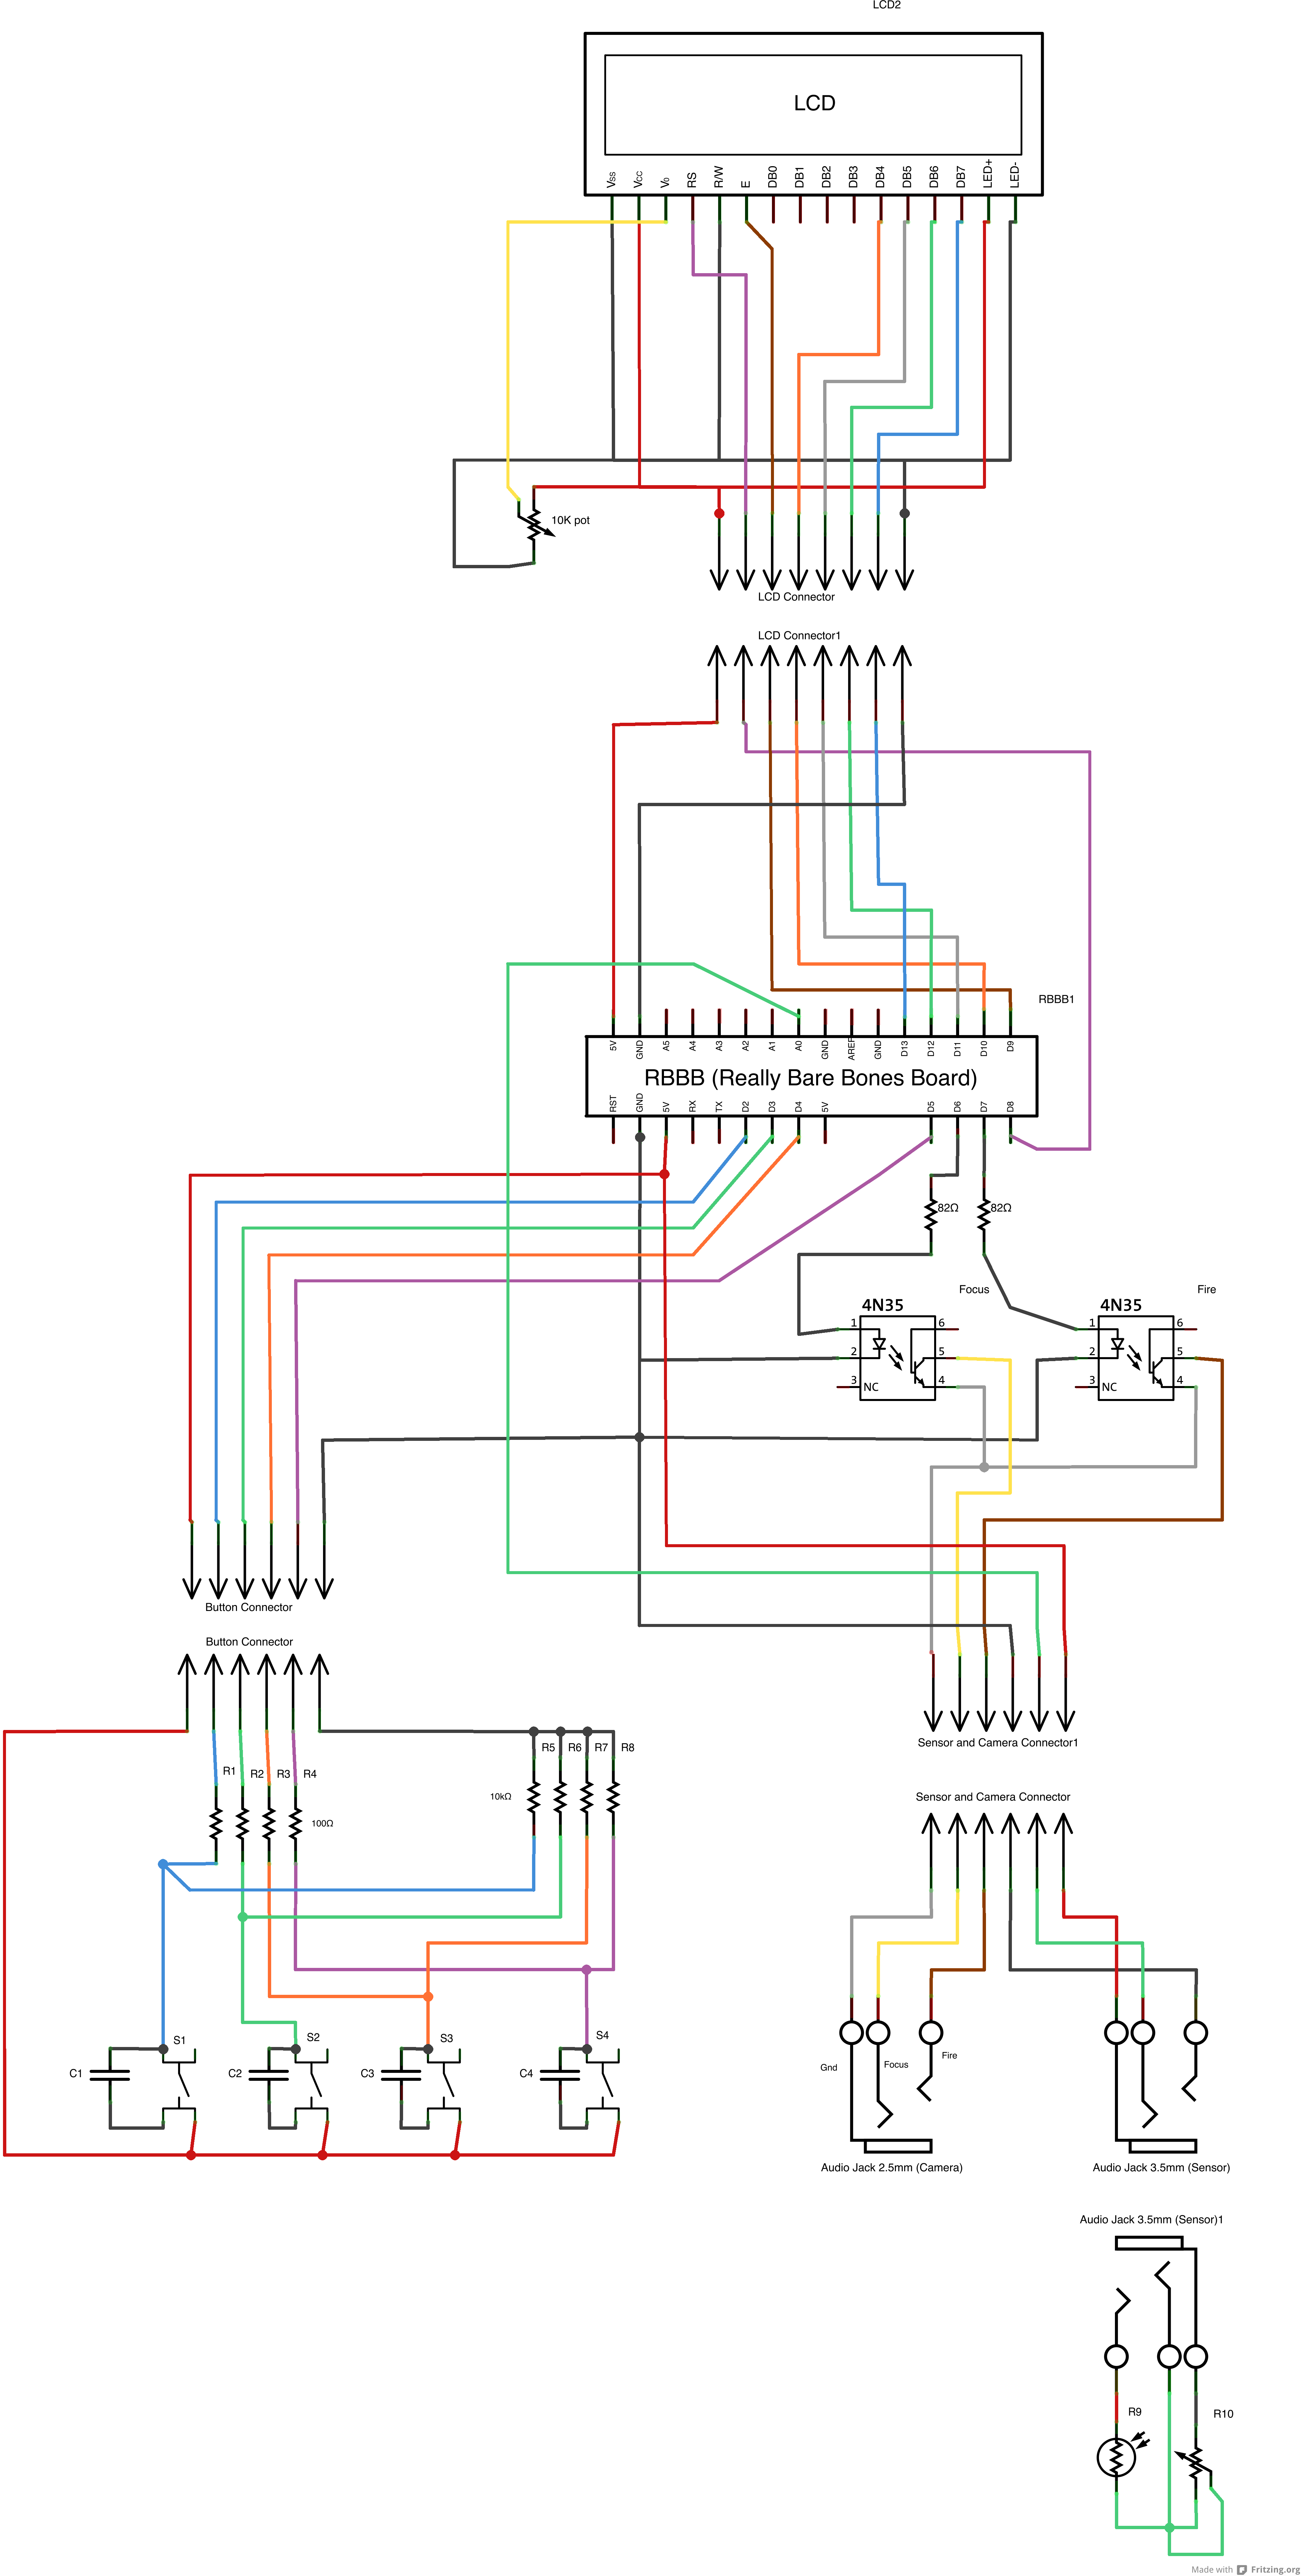 Camera Controller Schematic